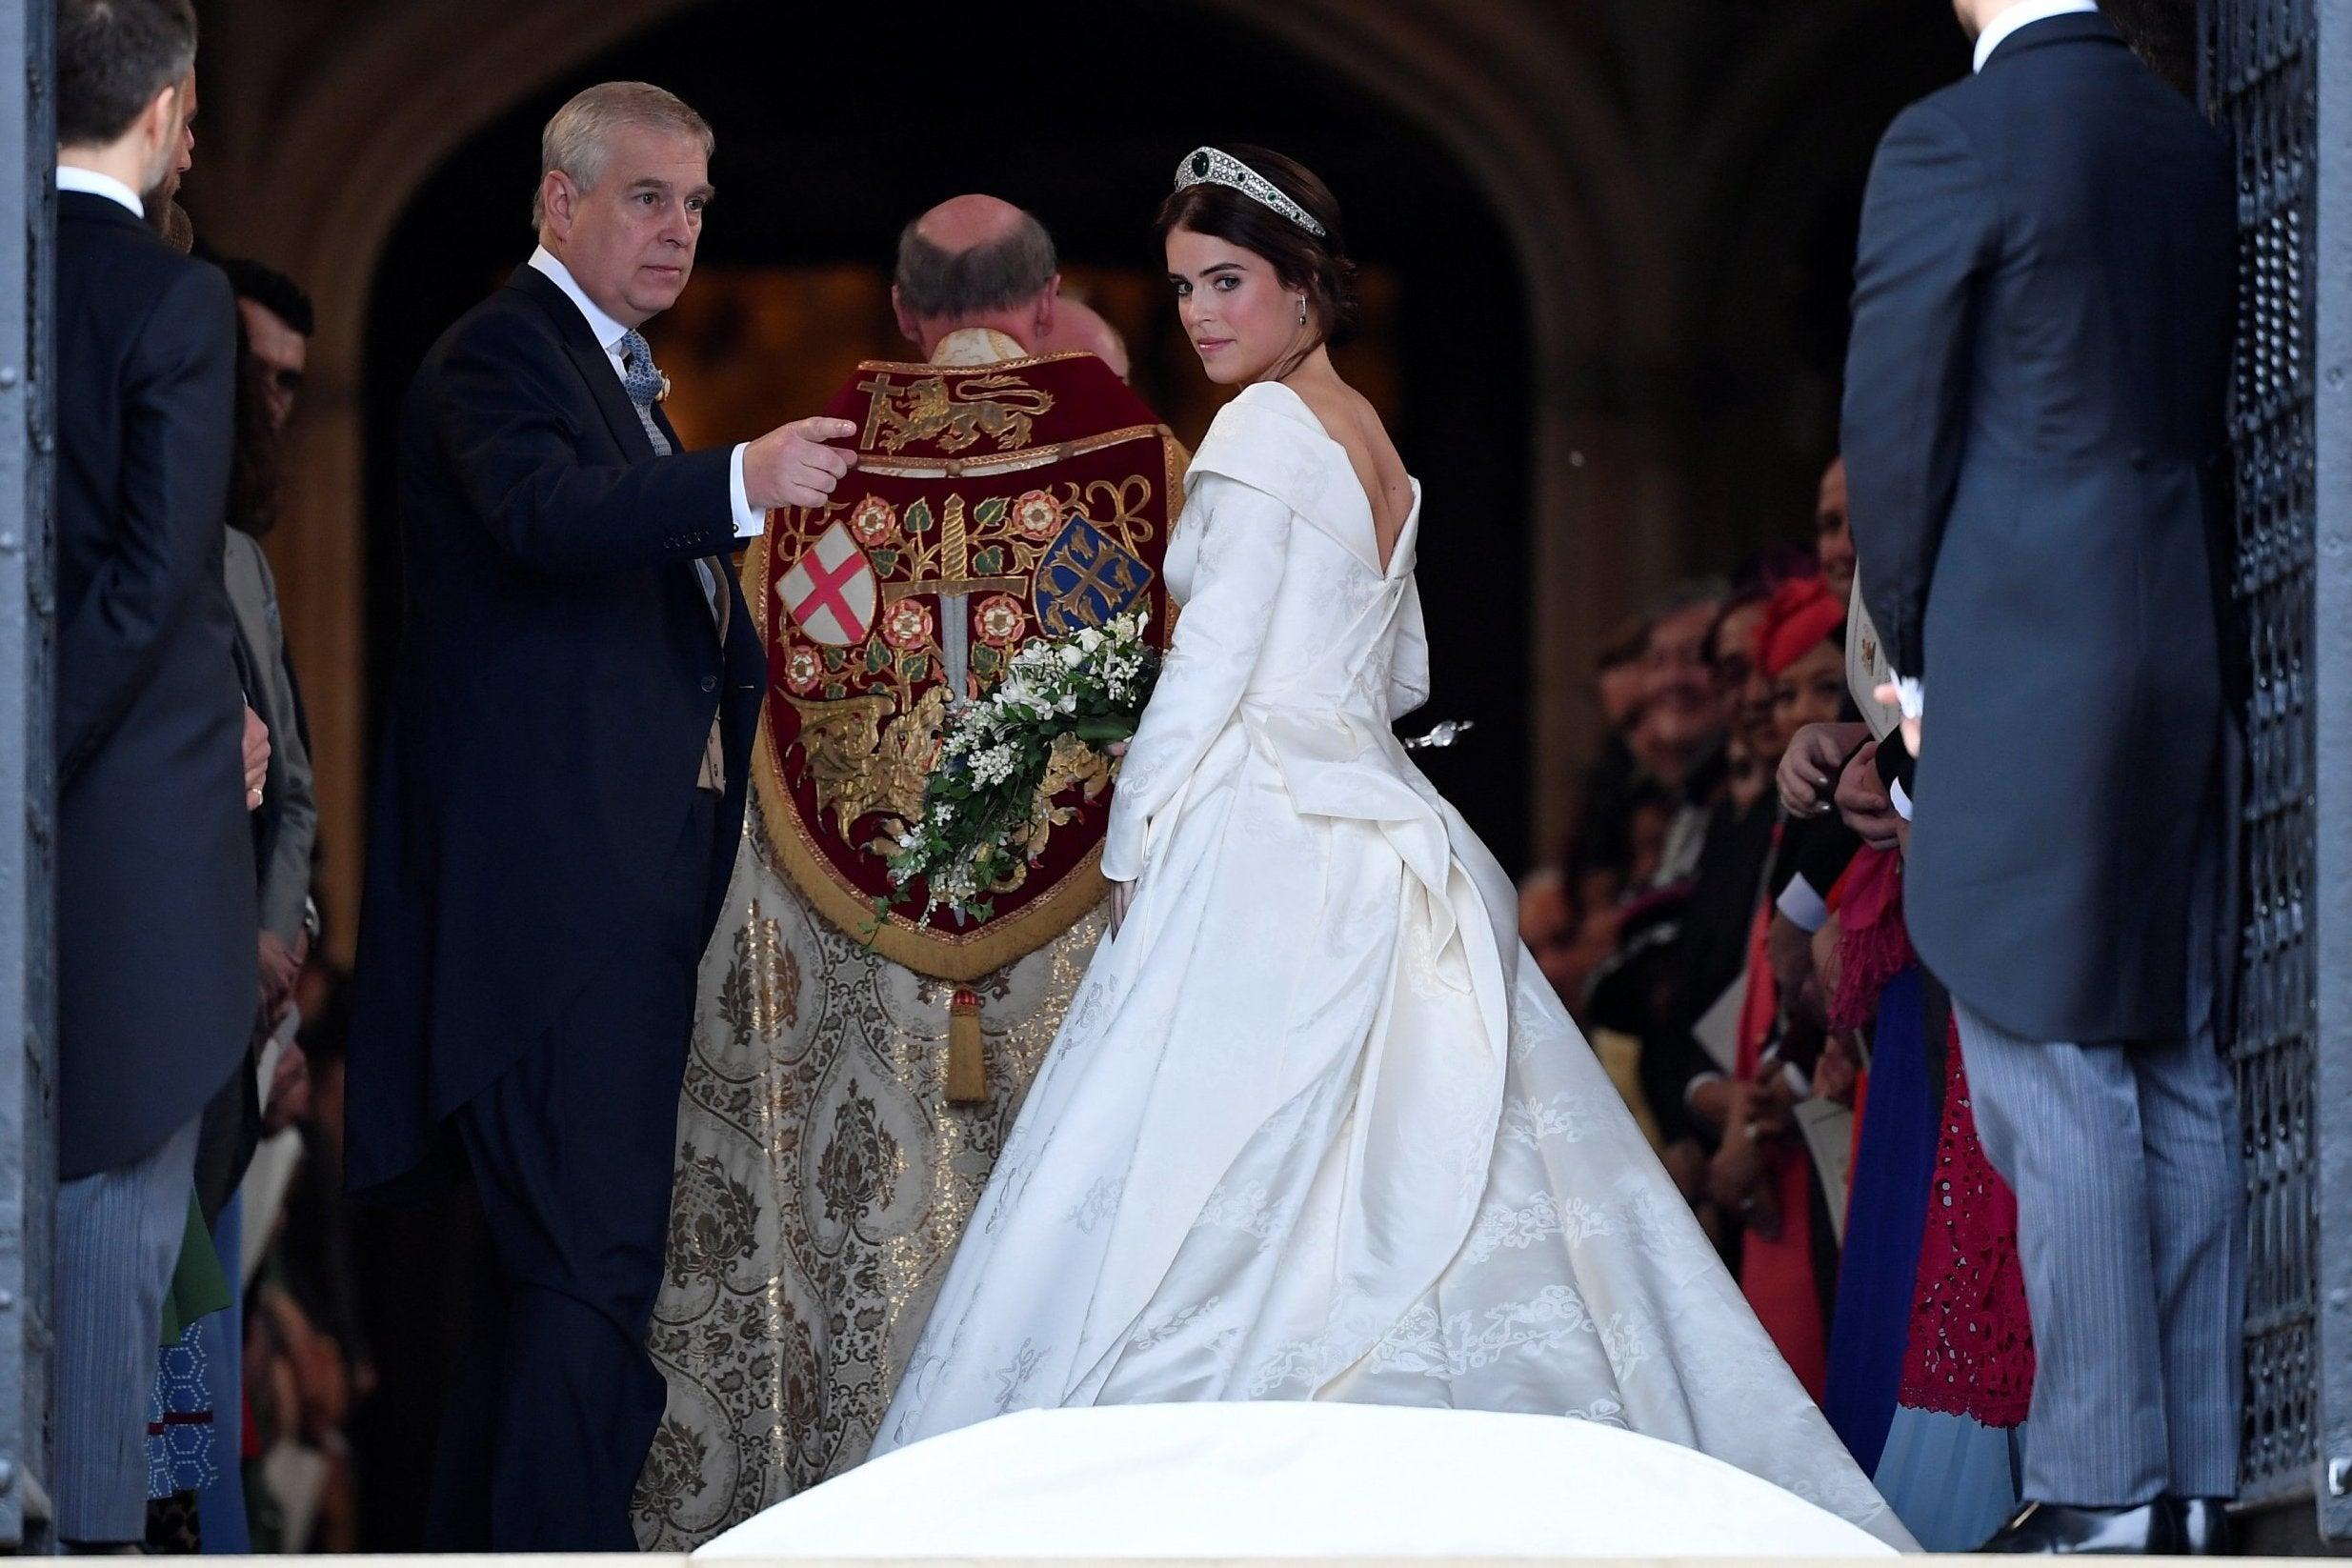 Royal Wedding: Princess Eugenie Wears Peter Pilotto And